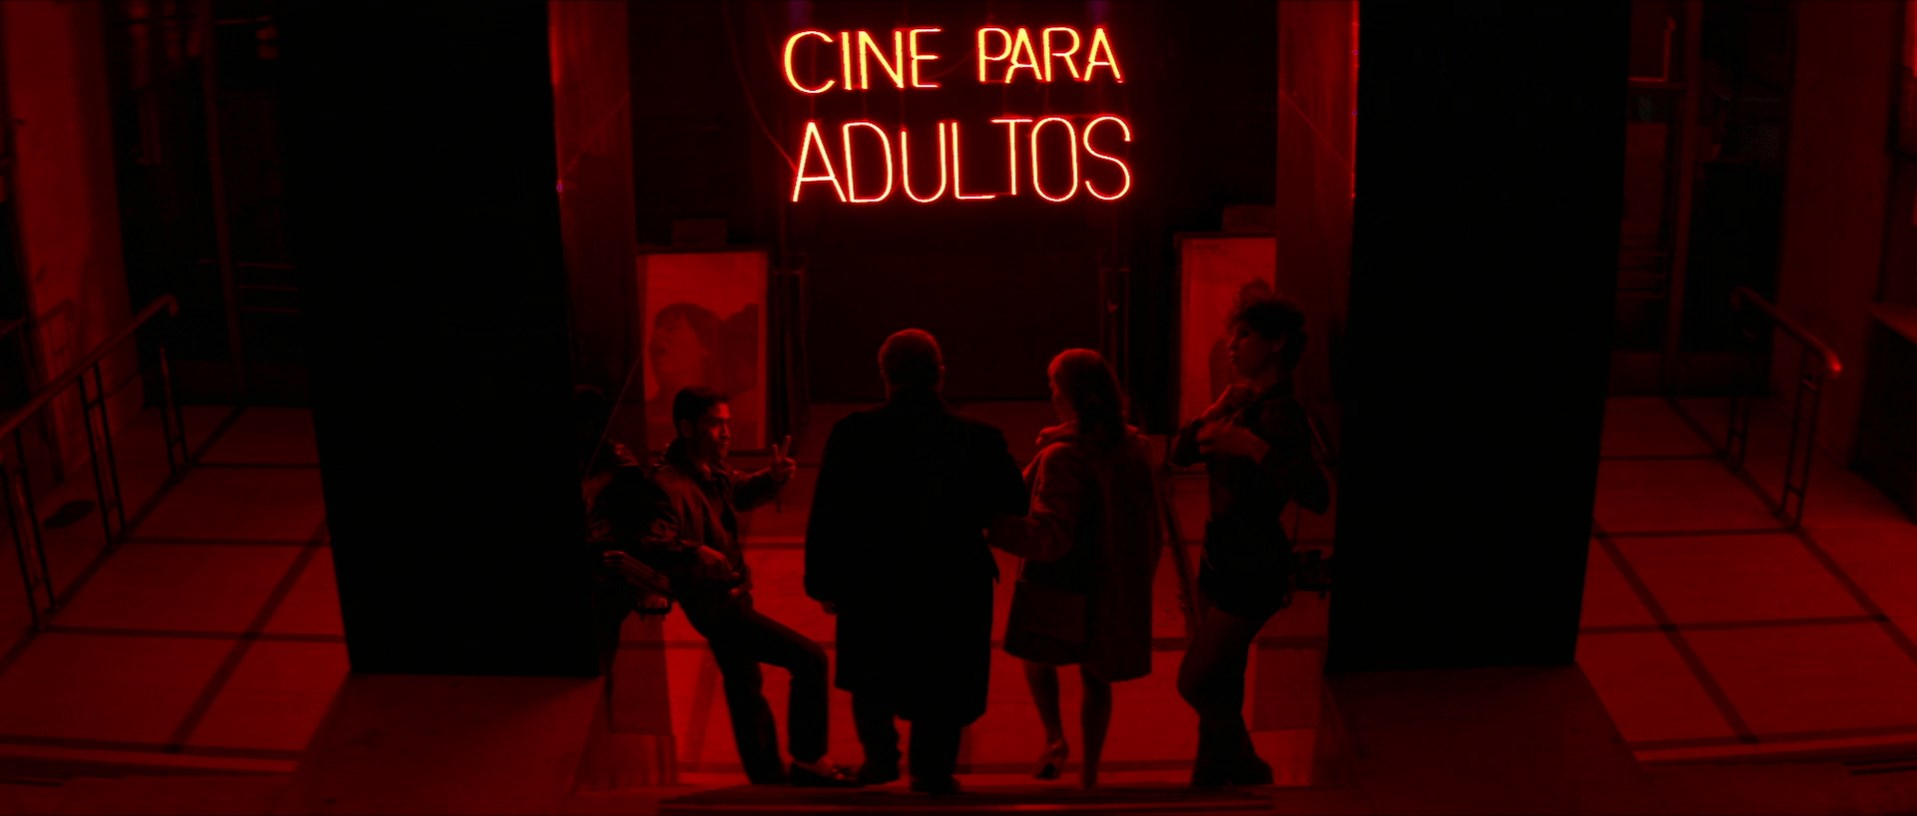 Tengo miedo torero (2020) 1080p WEB-DL AMZN Latino